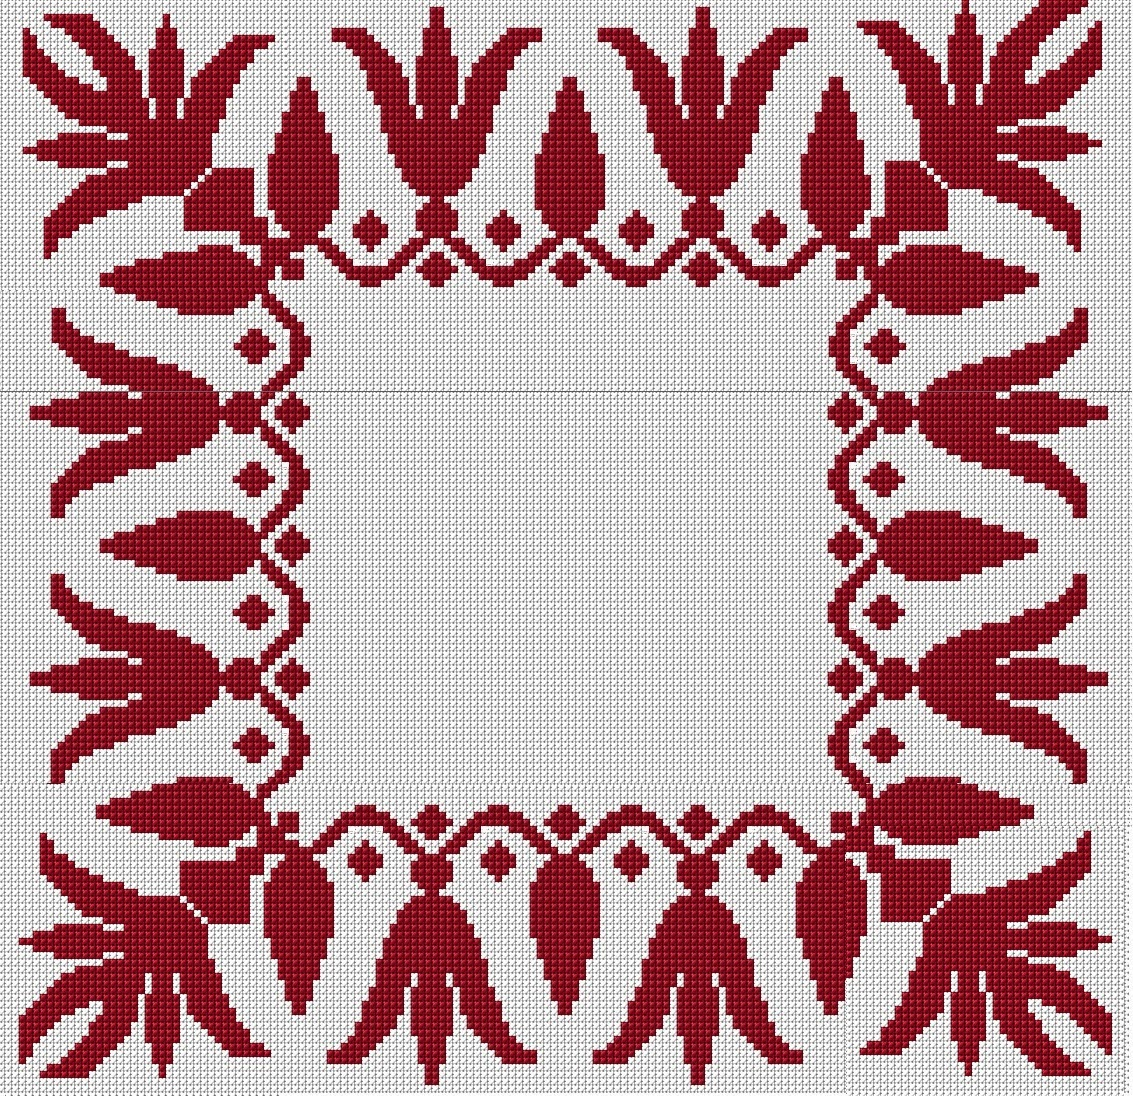 Sukanya's_Cross-Stitch_Work: New Cross stitch collection